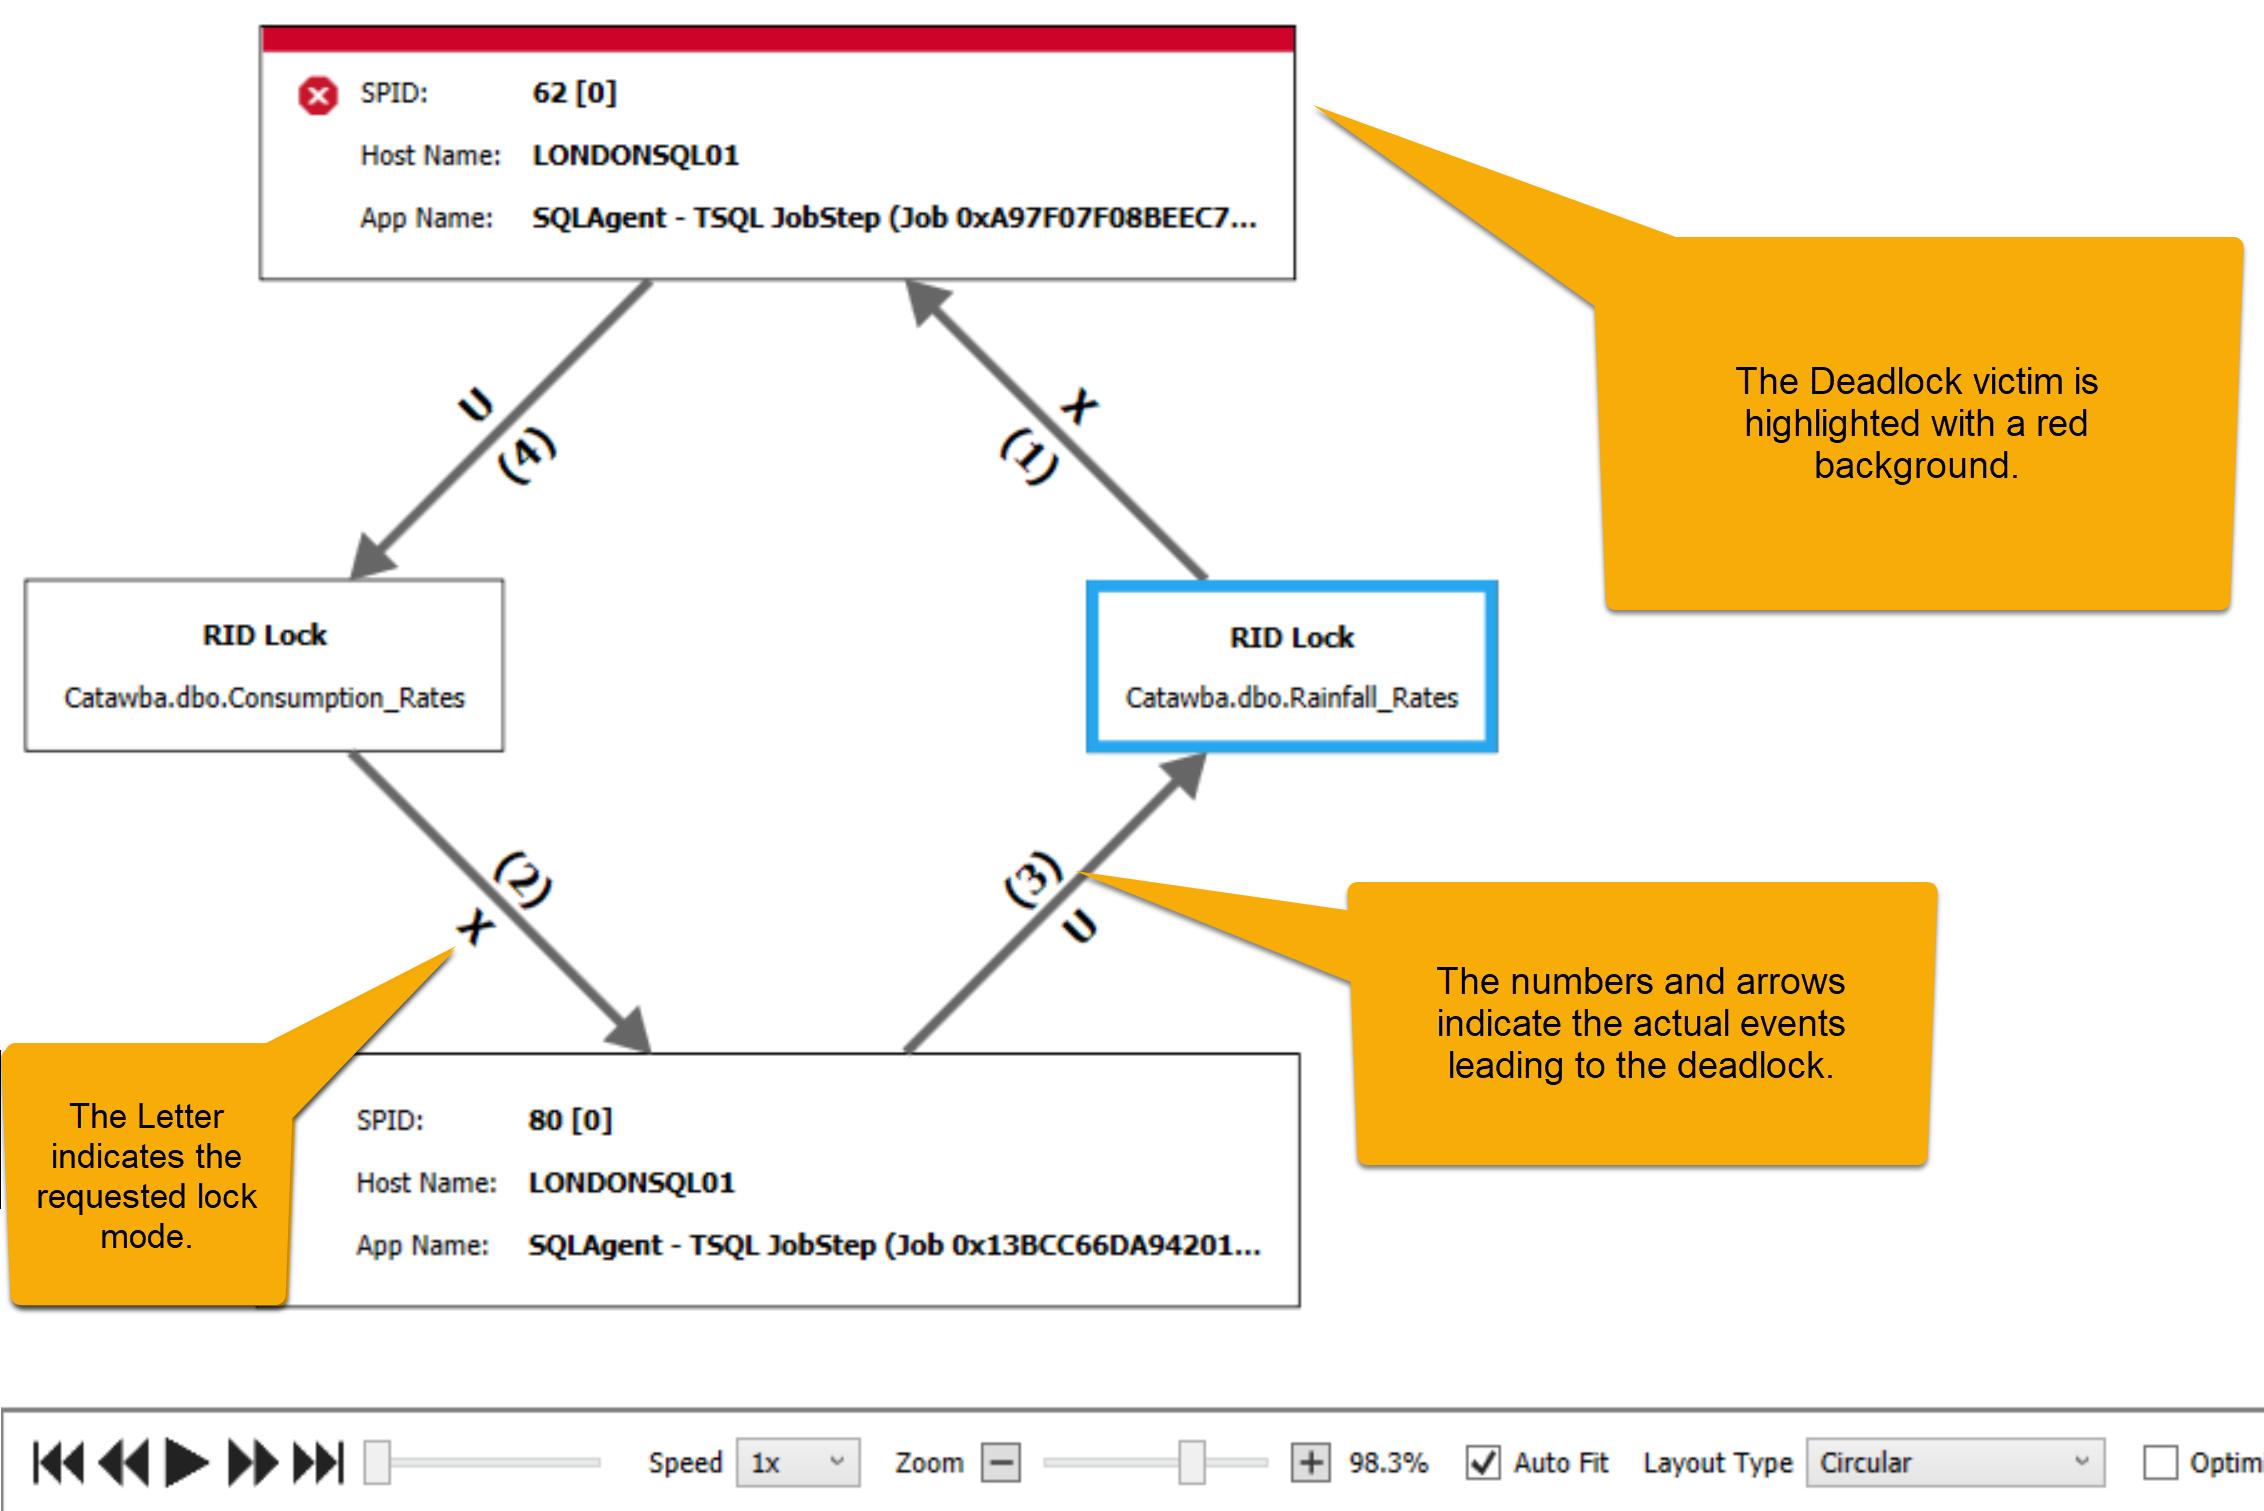 s1-deadlock-graphs-diagram-184